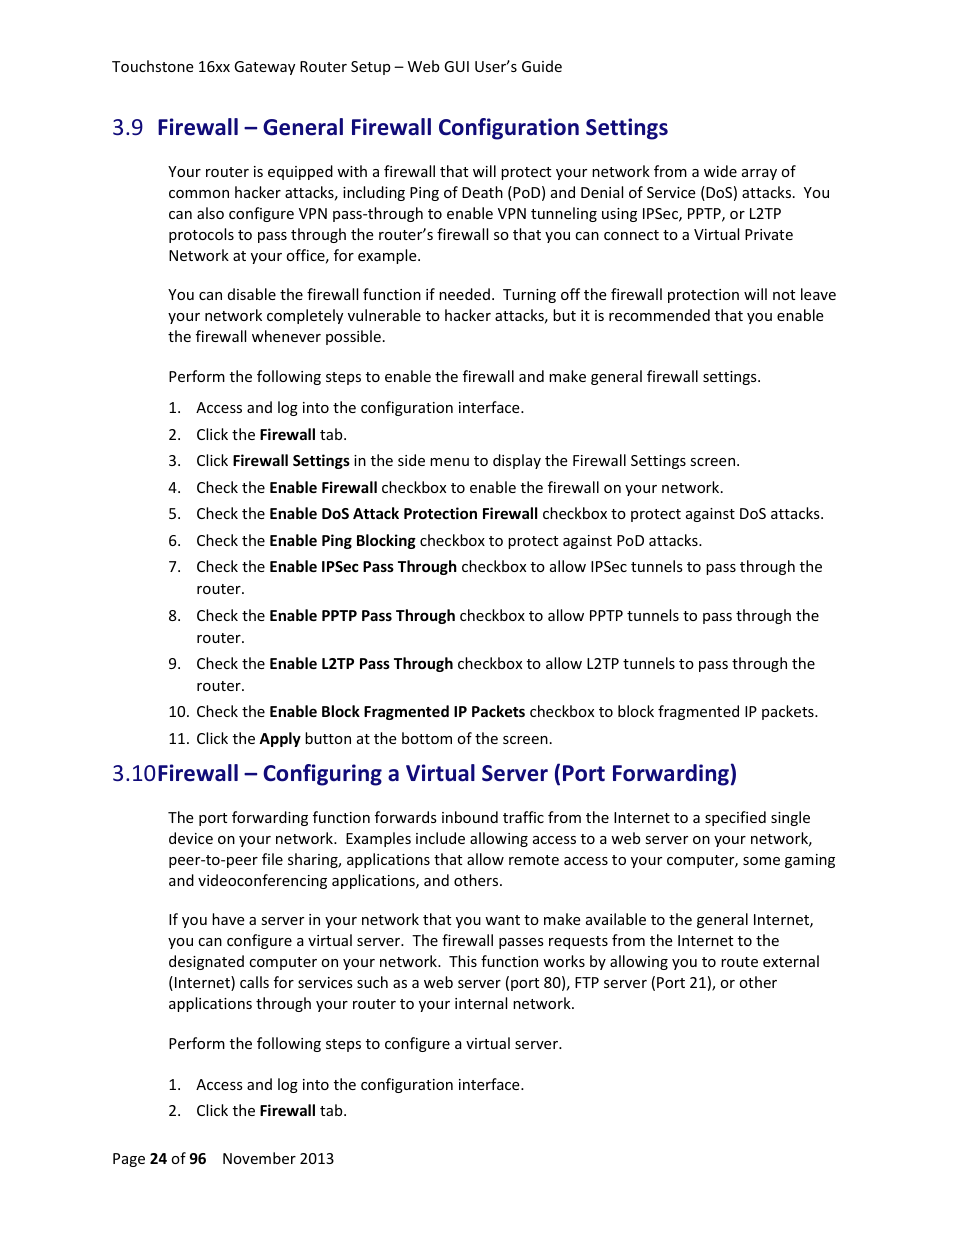 Firewall U2013 General Firewall Configuration Settings Manual Guide